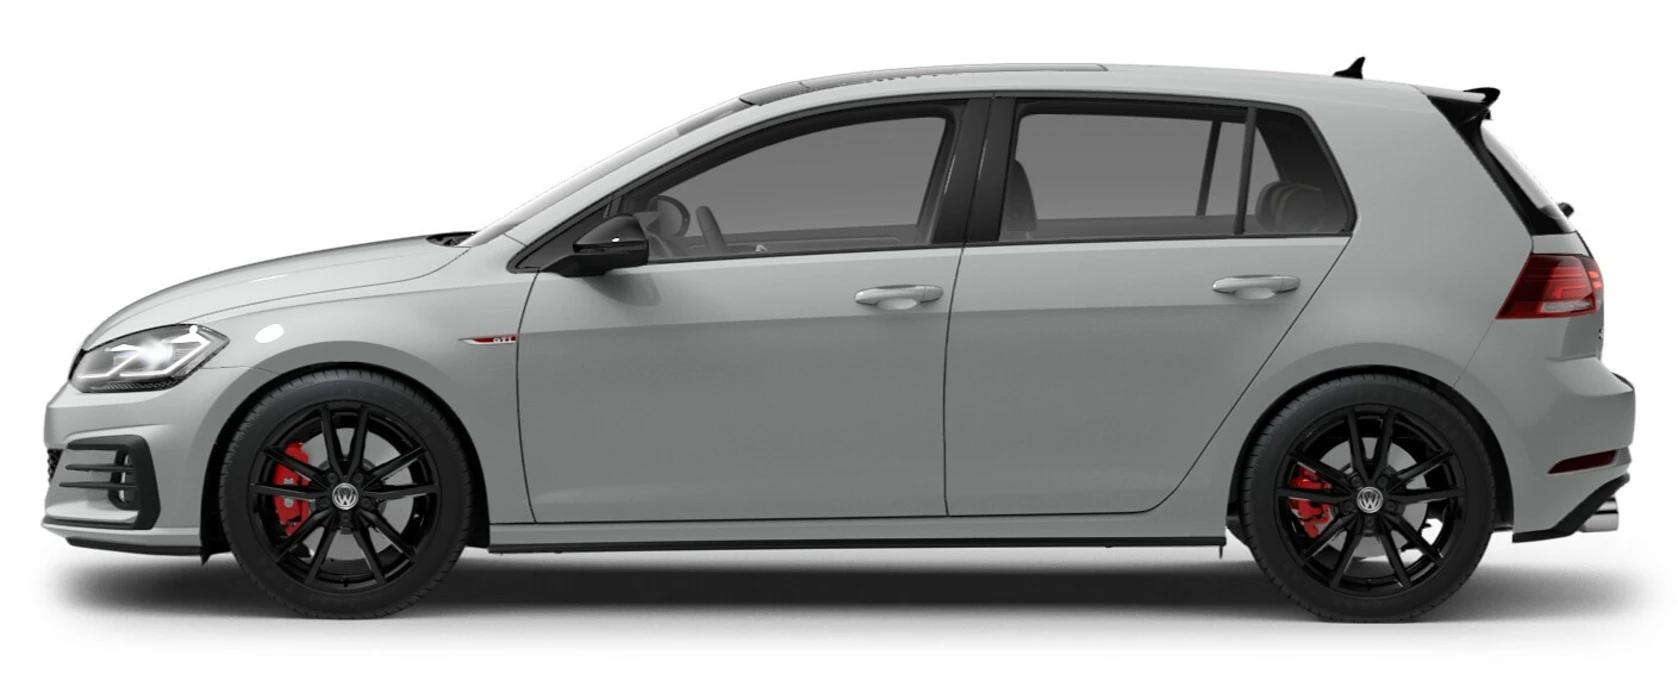 2021 Volkswagen Golf GTI Pure White